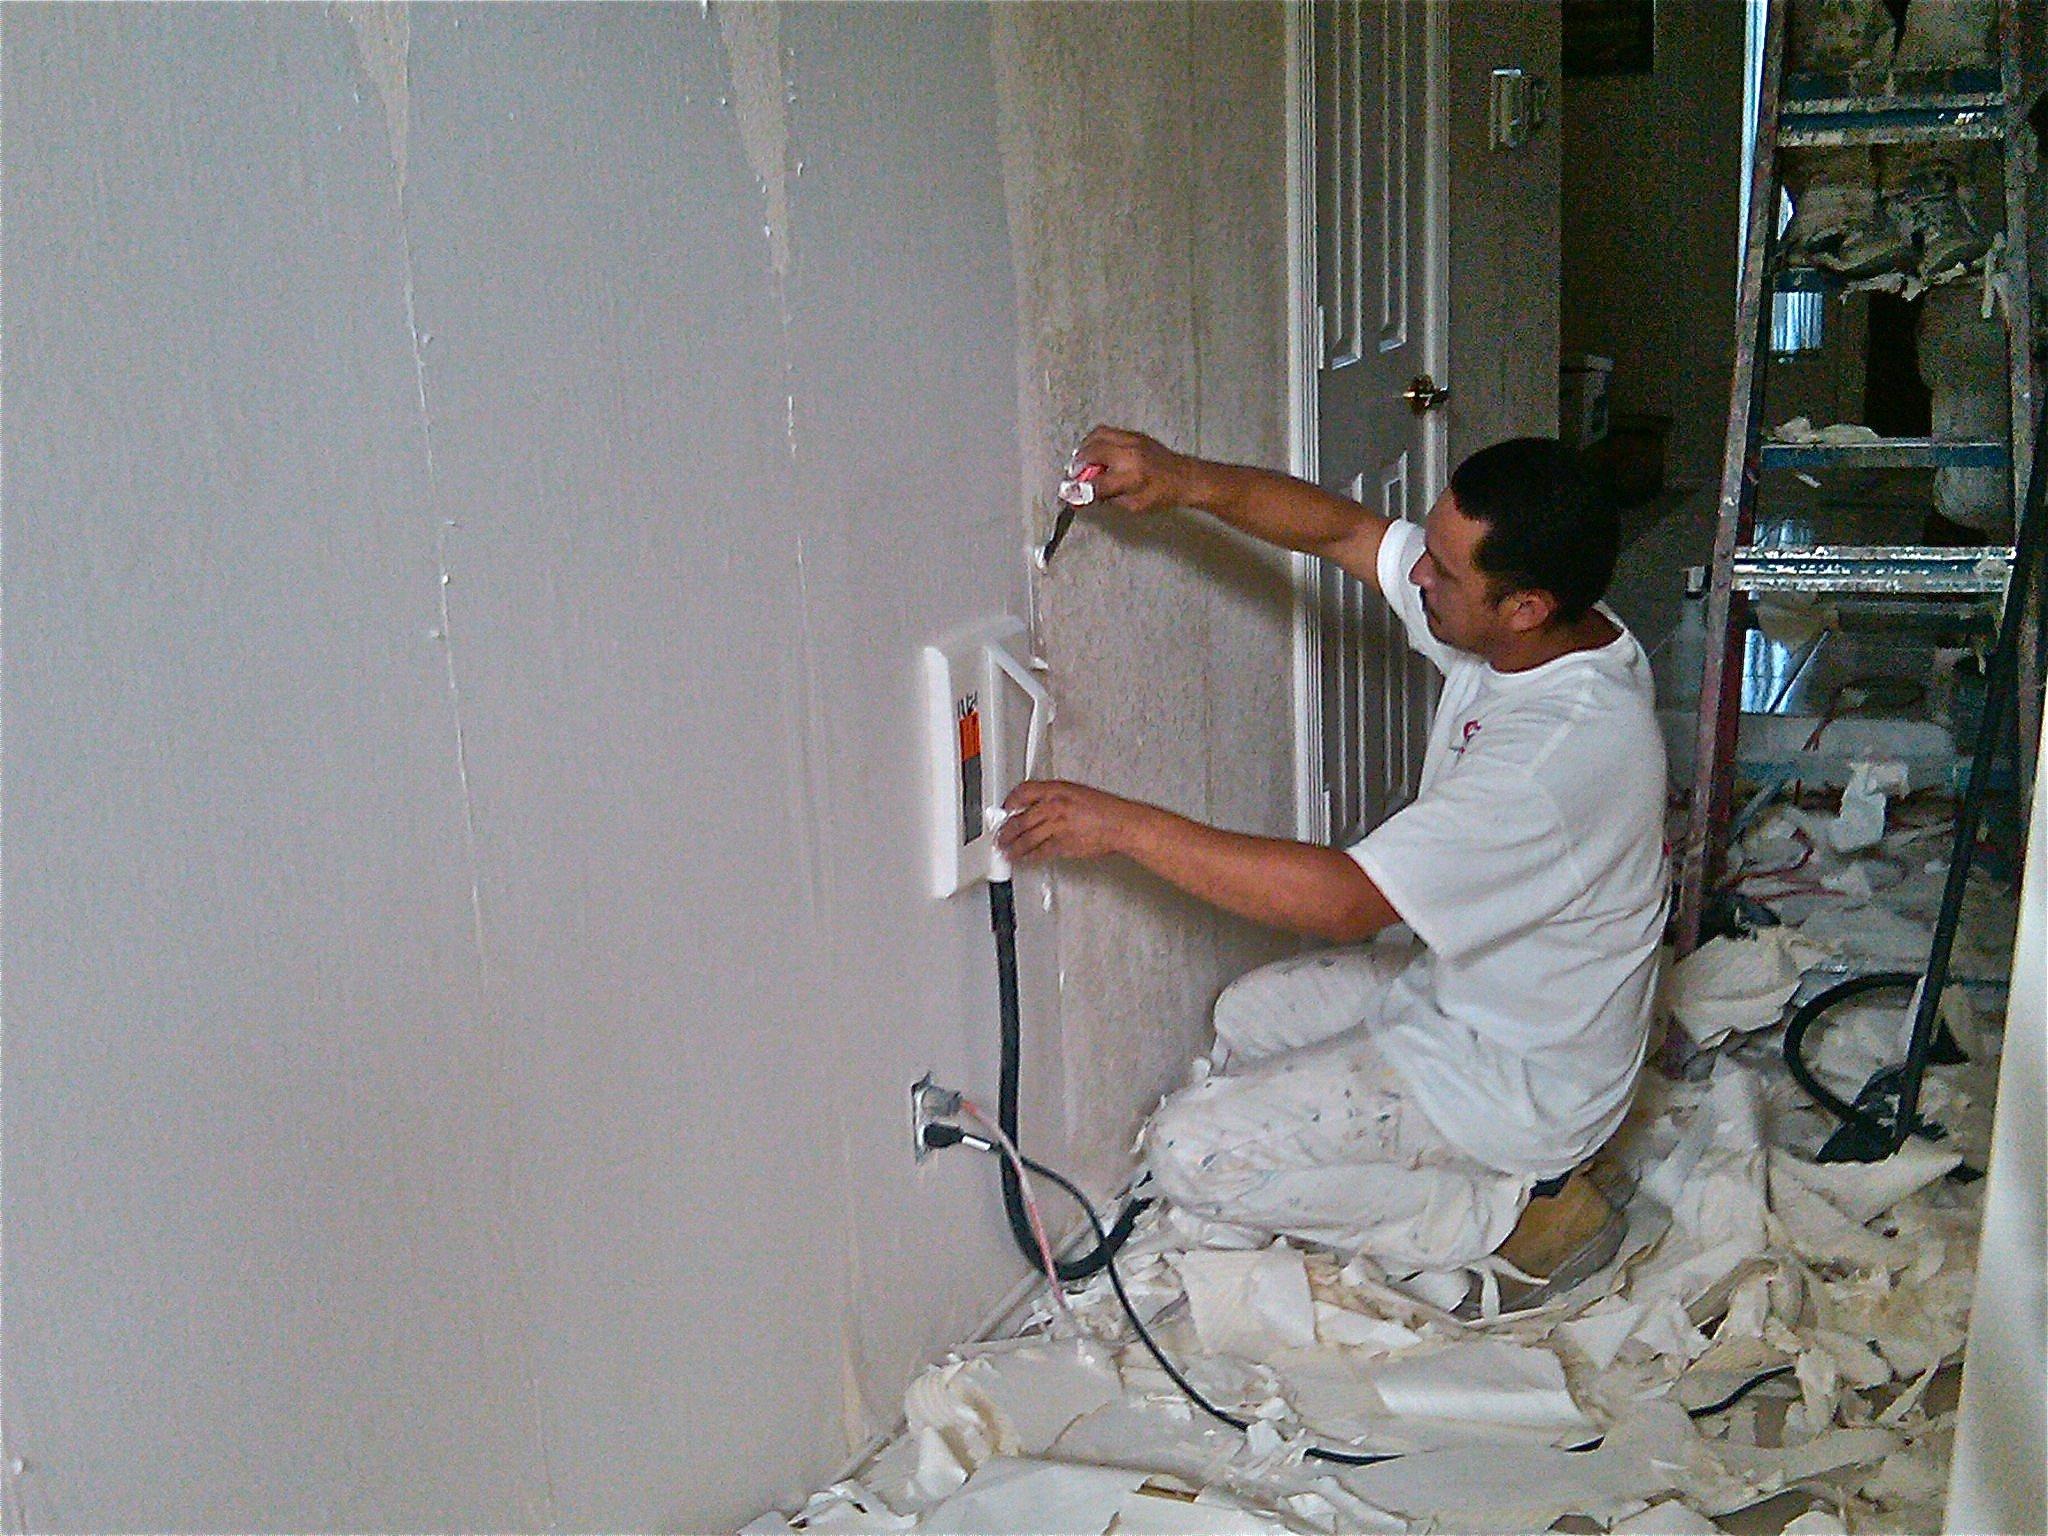 Wallpaper Removal 2048x1536